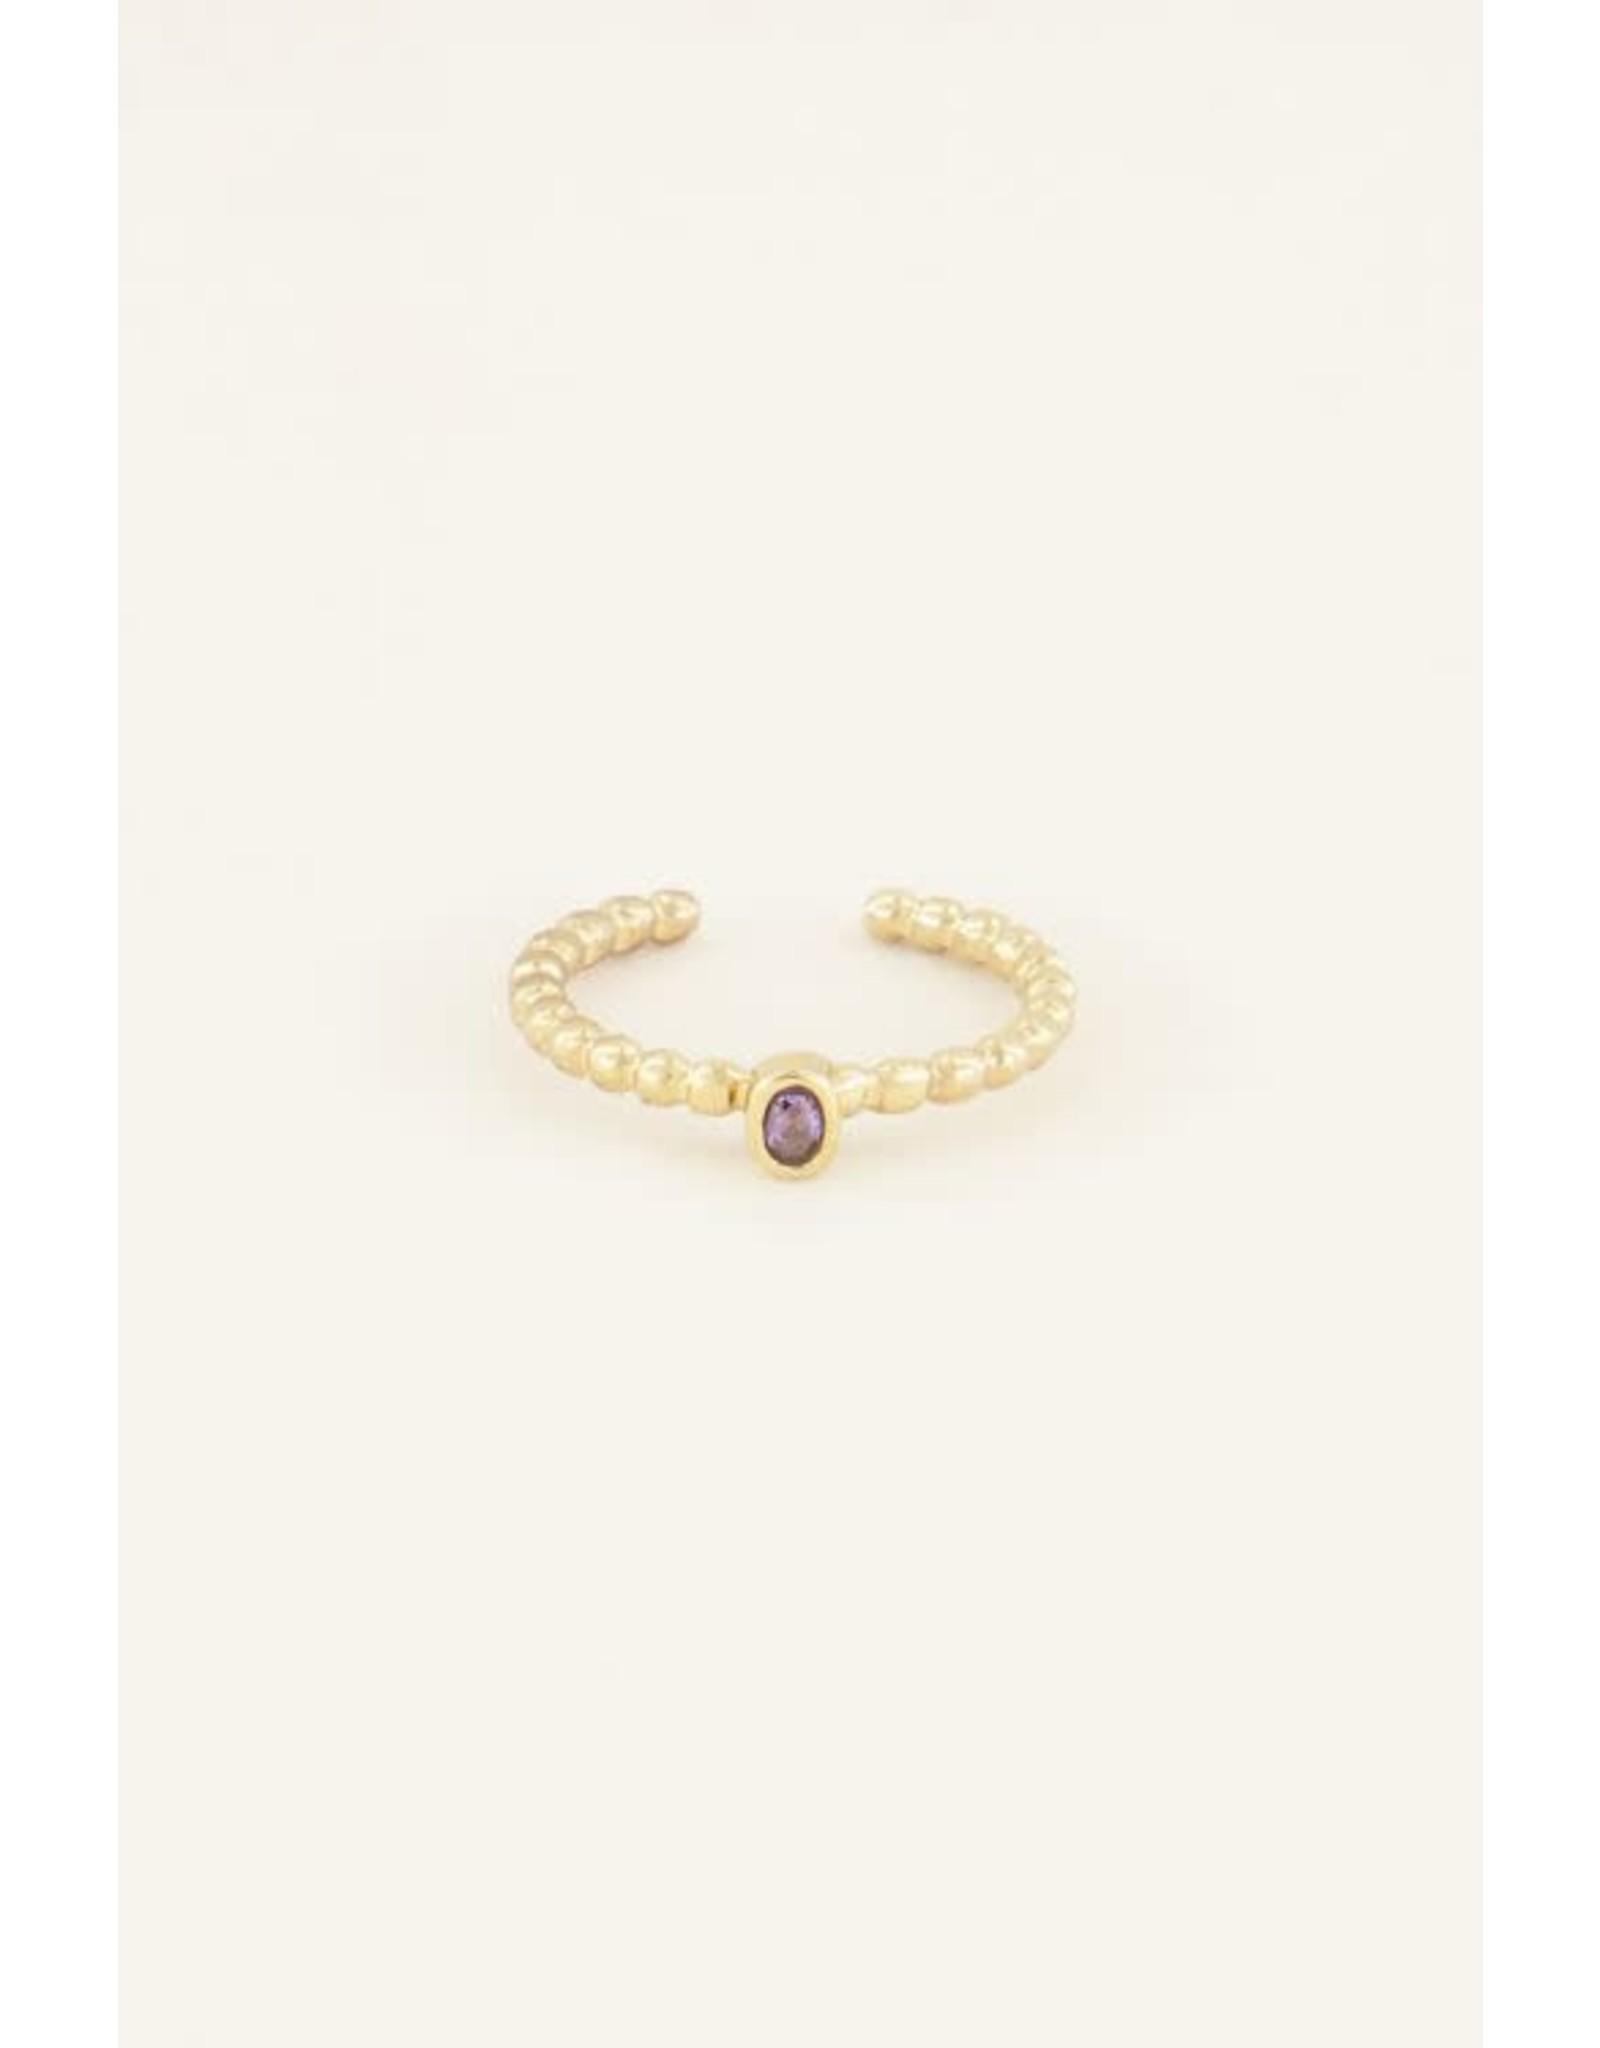 My Jewellery My Jewellery geboortesteen ring september